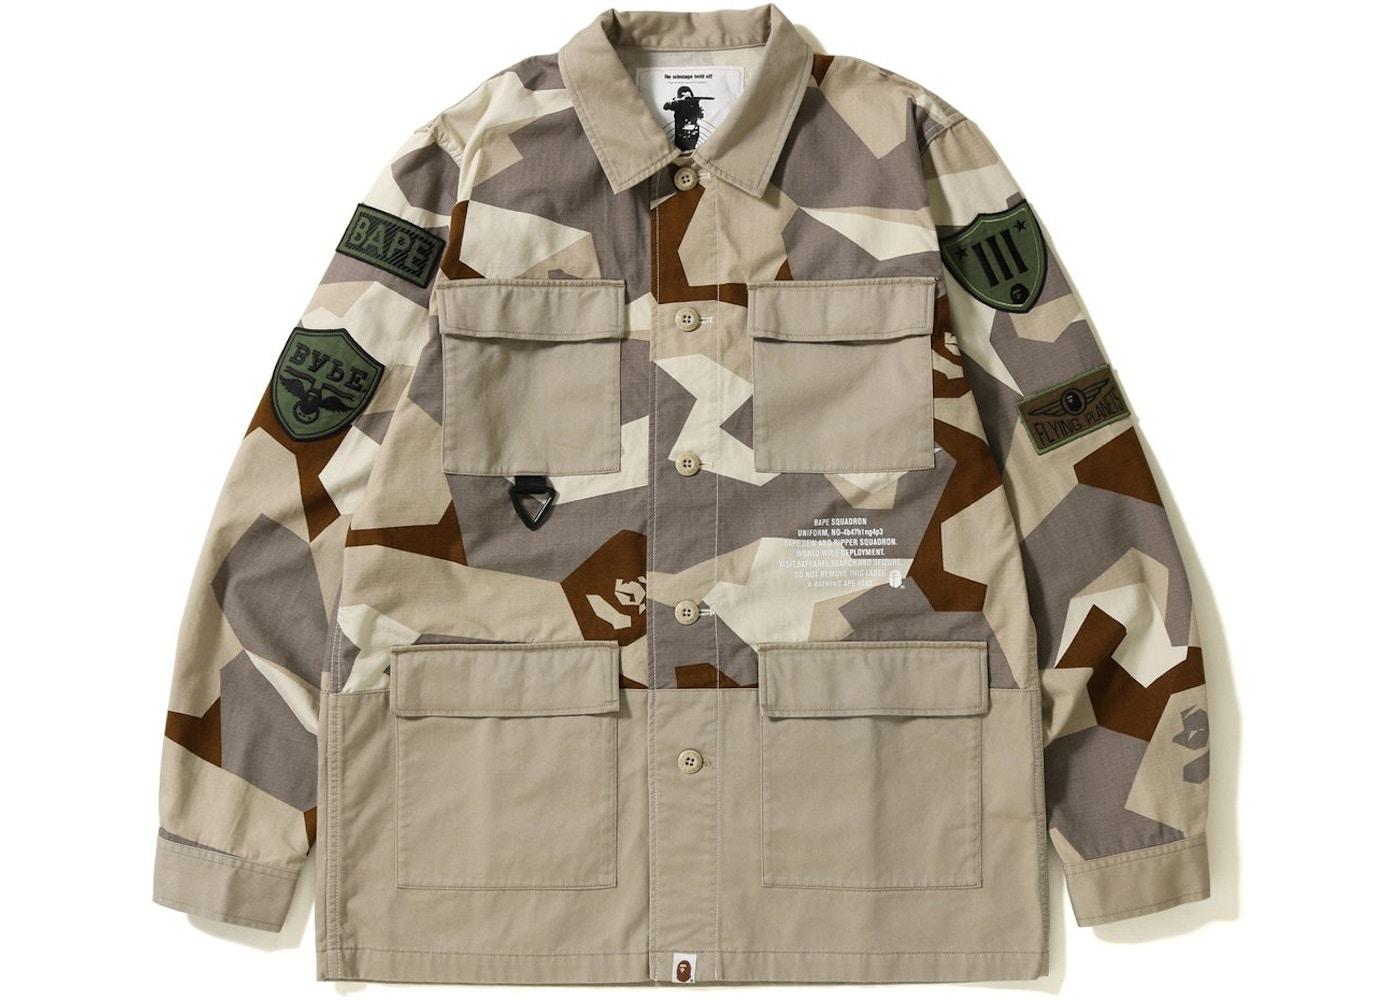 265cbd60 Bape Shirts Stockx